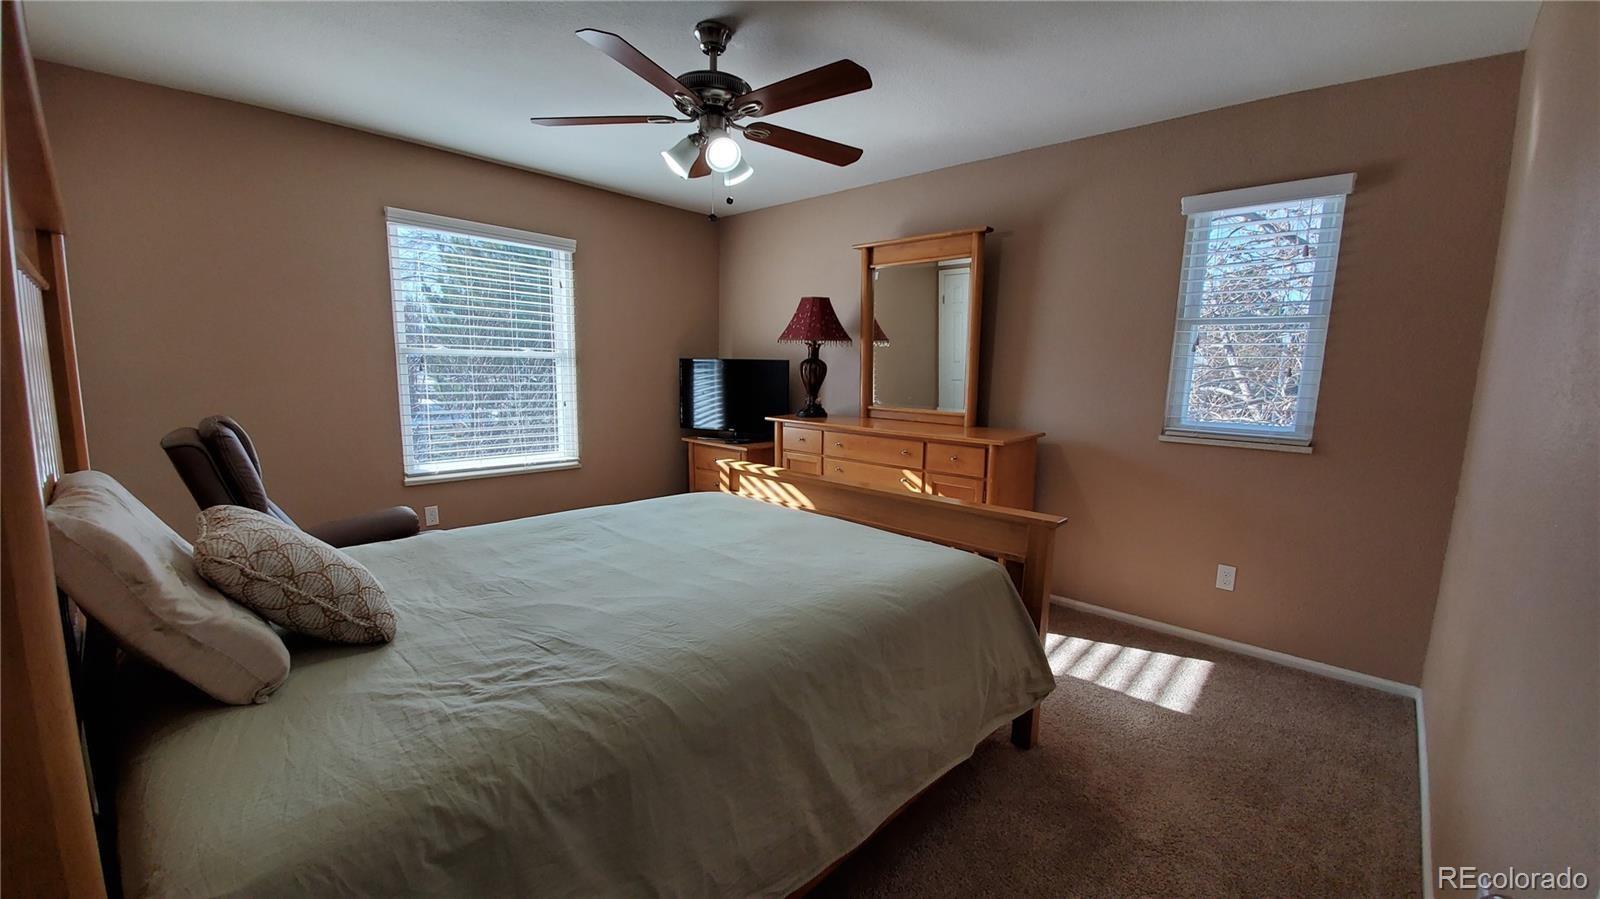 MLS# 5298567 - 15 - 3036 S Flower Court, Lakewood, CO 80227